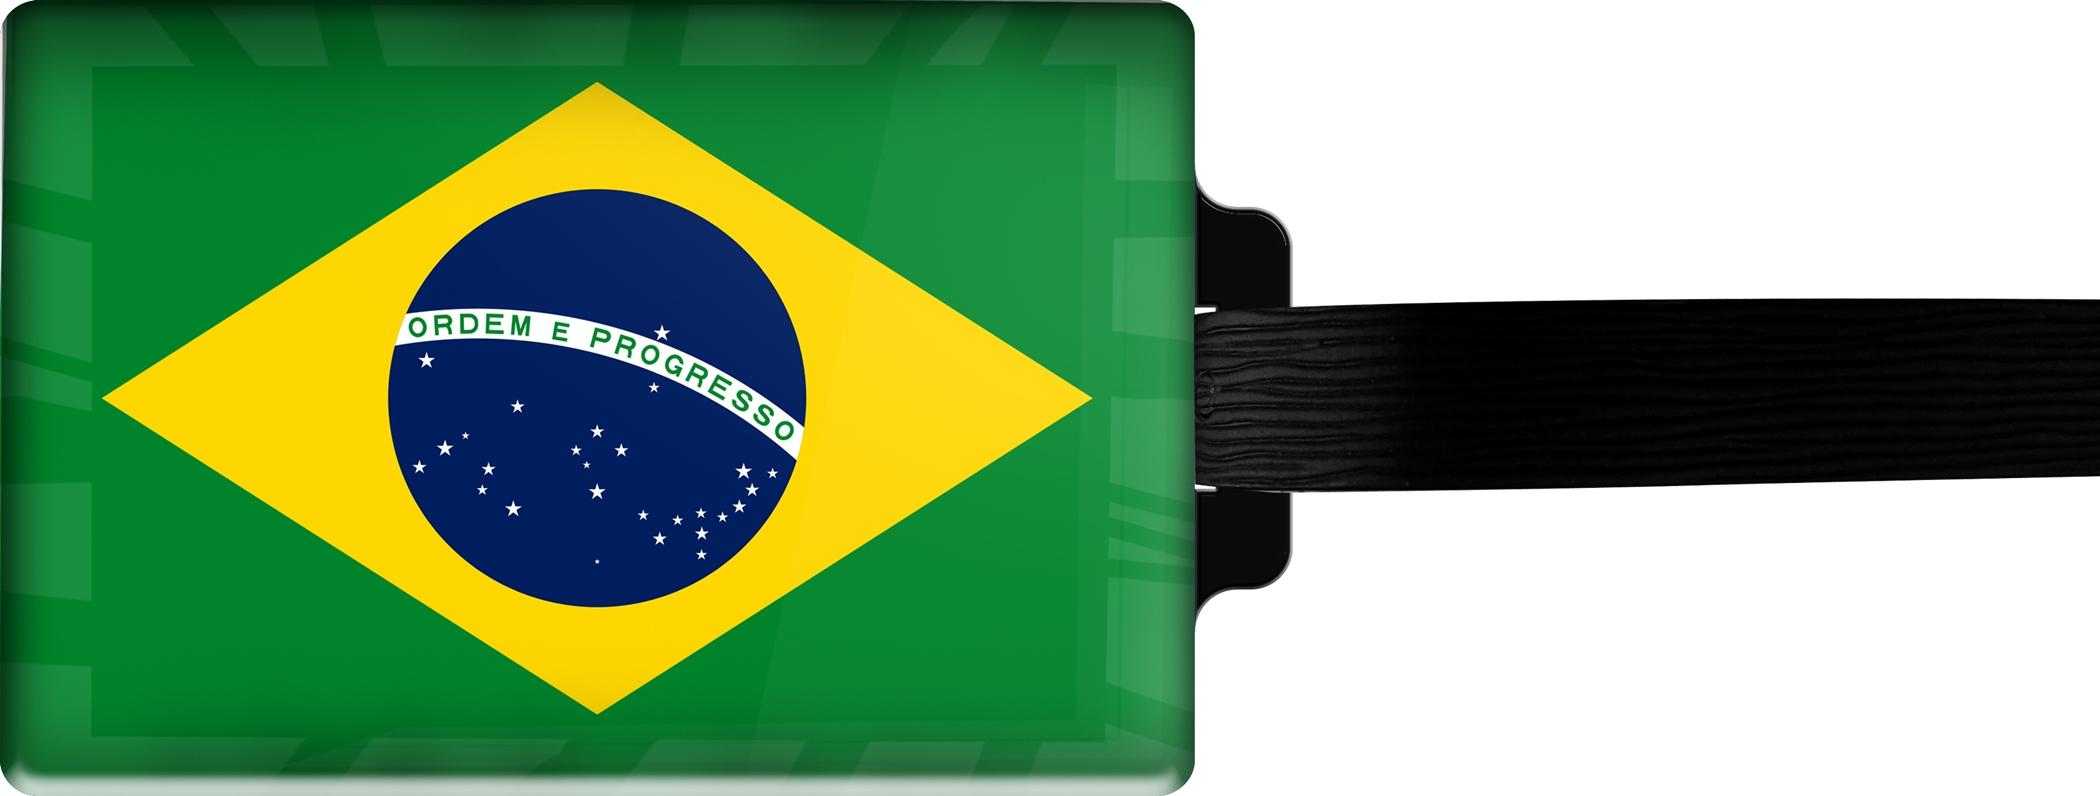 Hochwertiger Gepäckanhänger aus Acrylglas | FLAGGE BRASILIEN | metALUm #00083